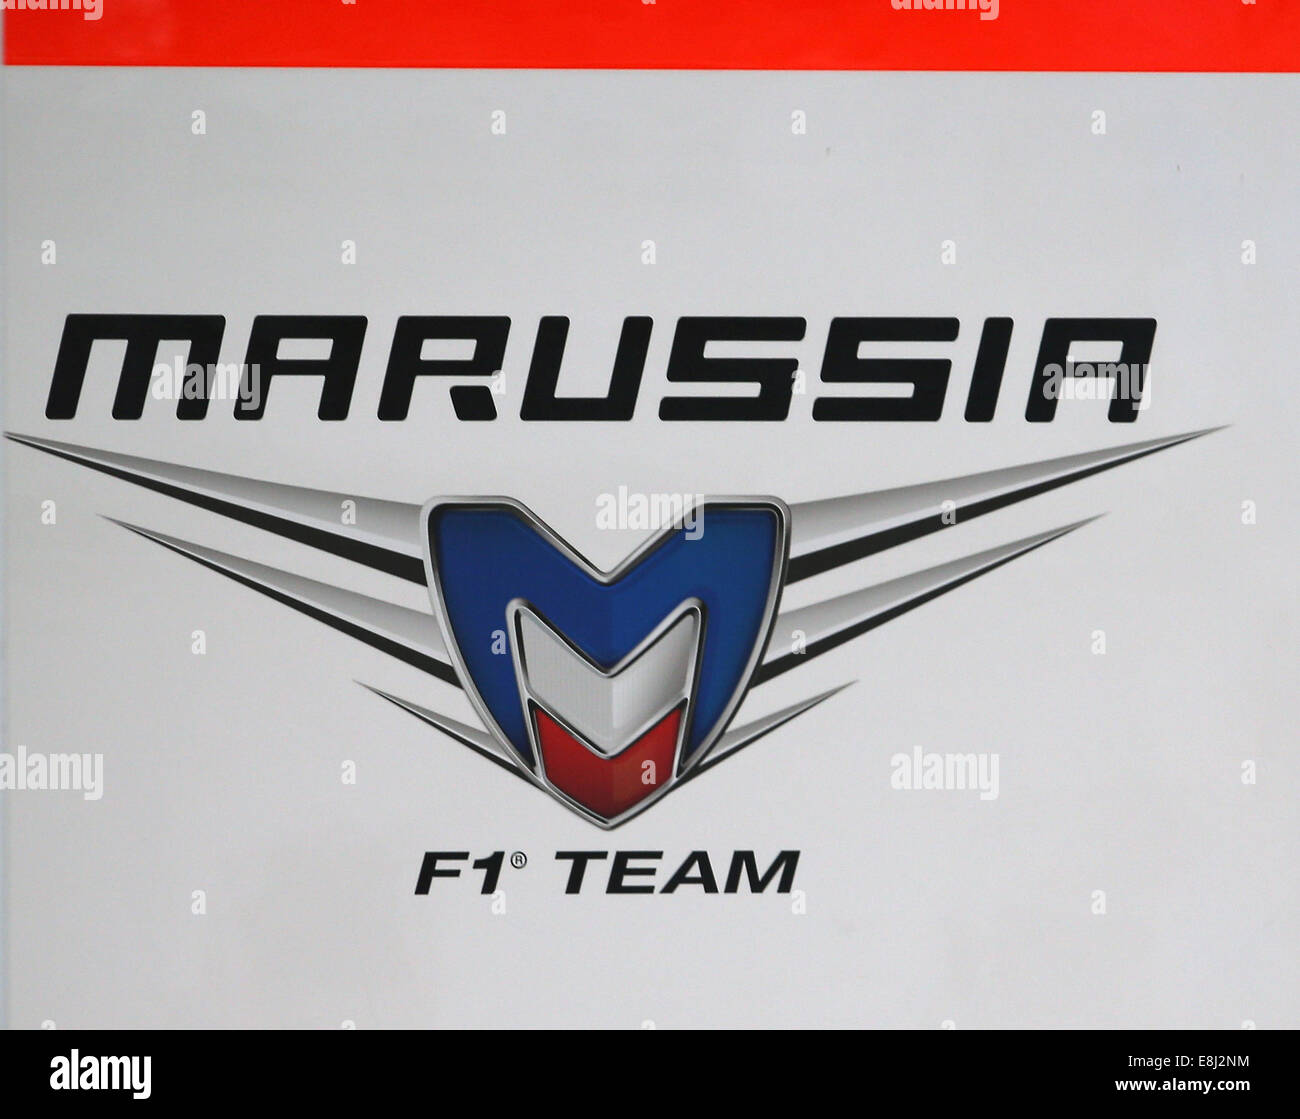 A Logo Of The Russian F1 Team Marussia. © Vitaly Timkiv/TASS/Alamy Live News